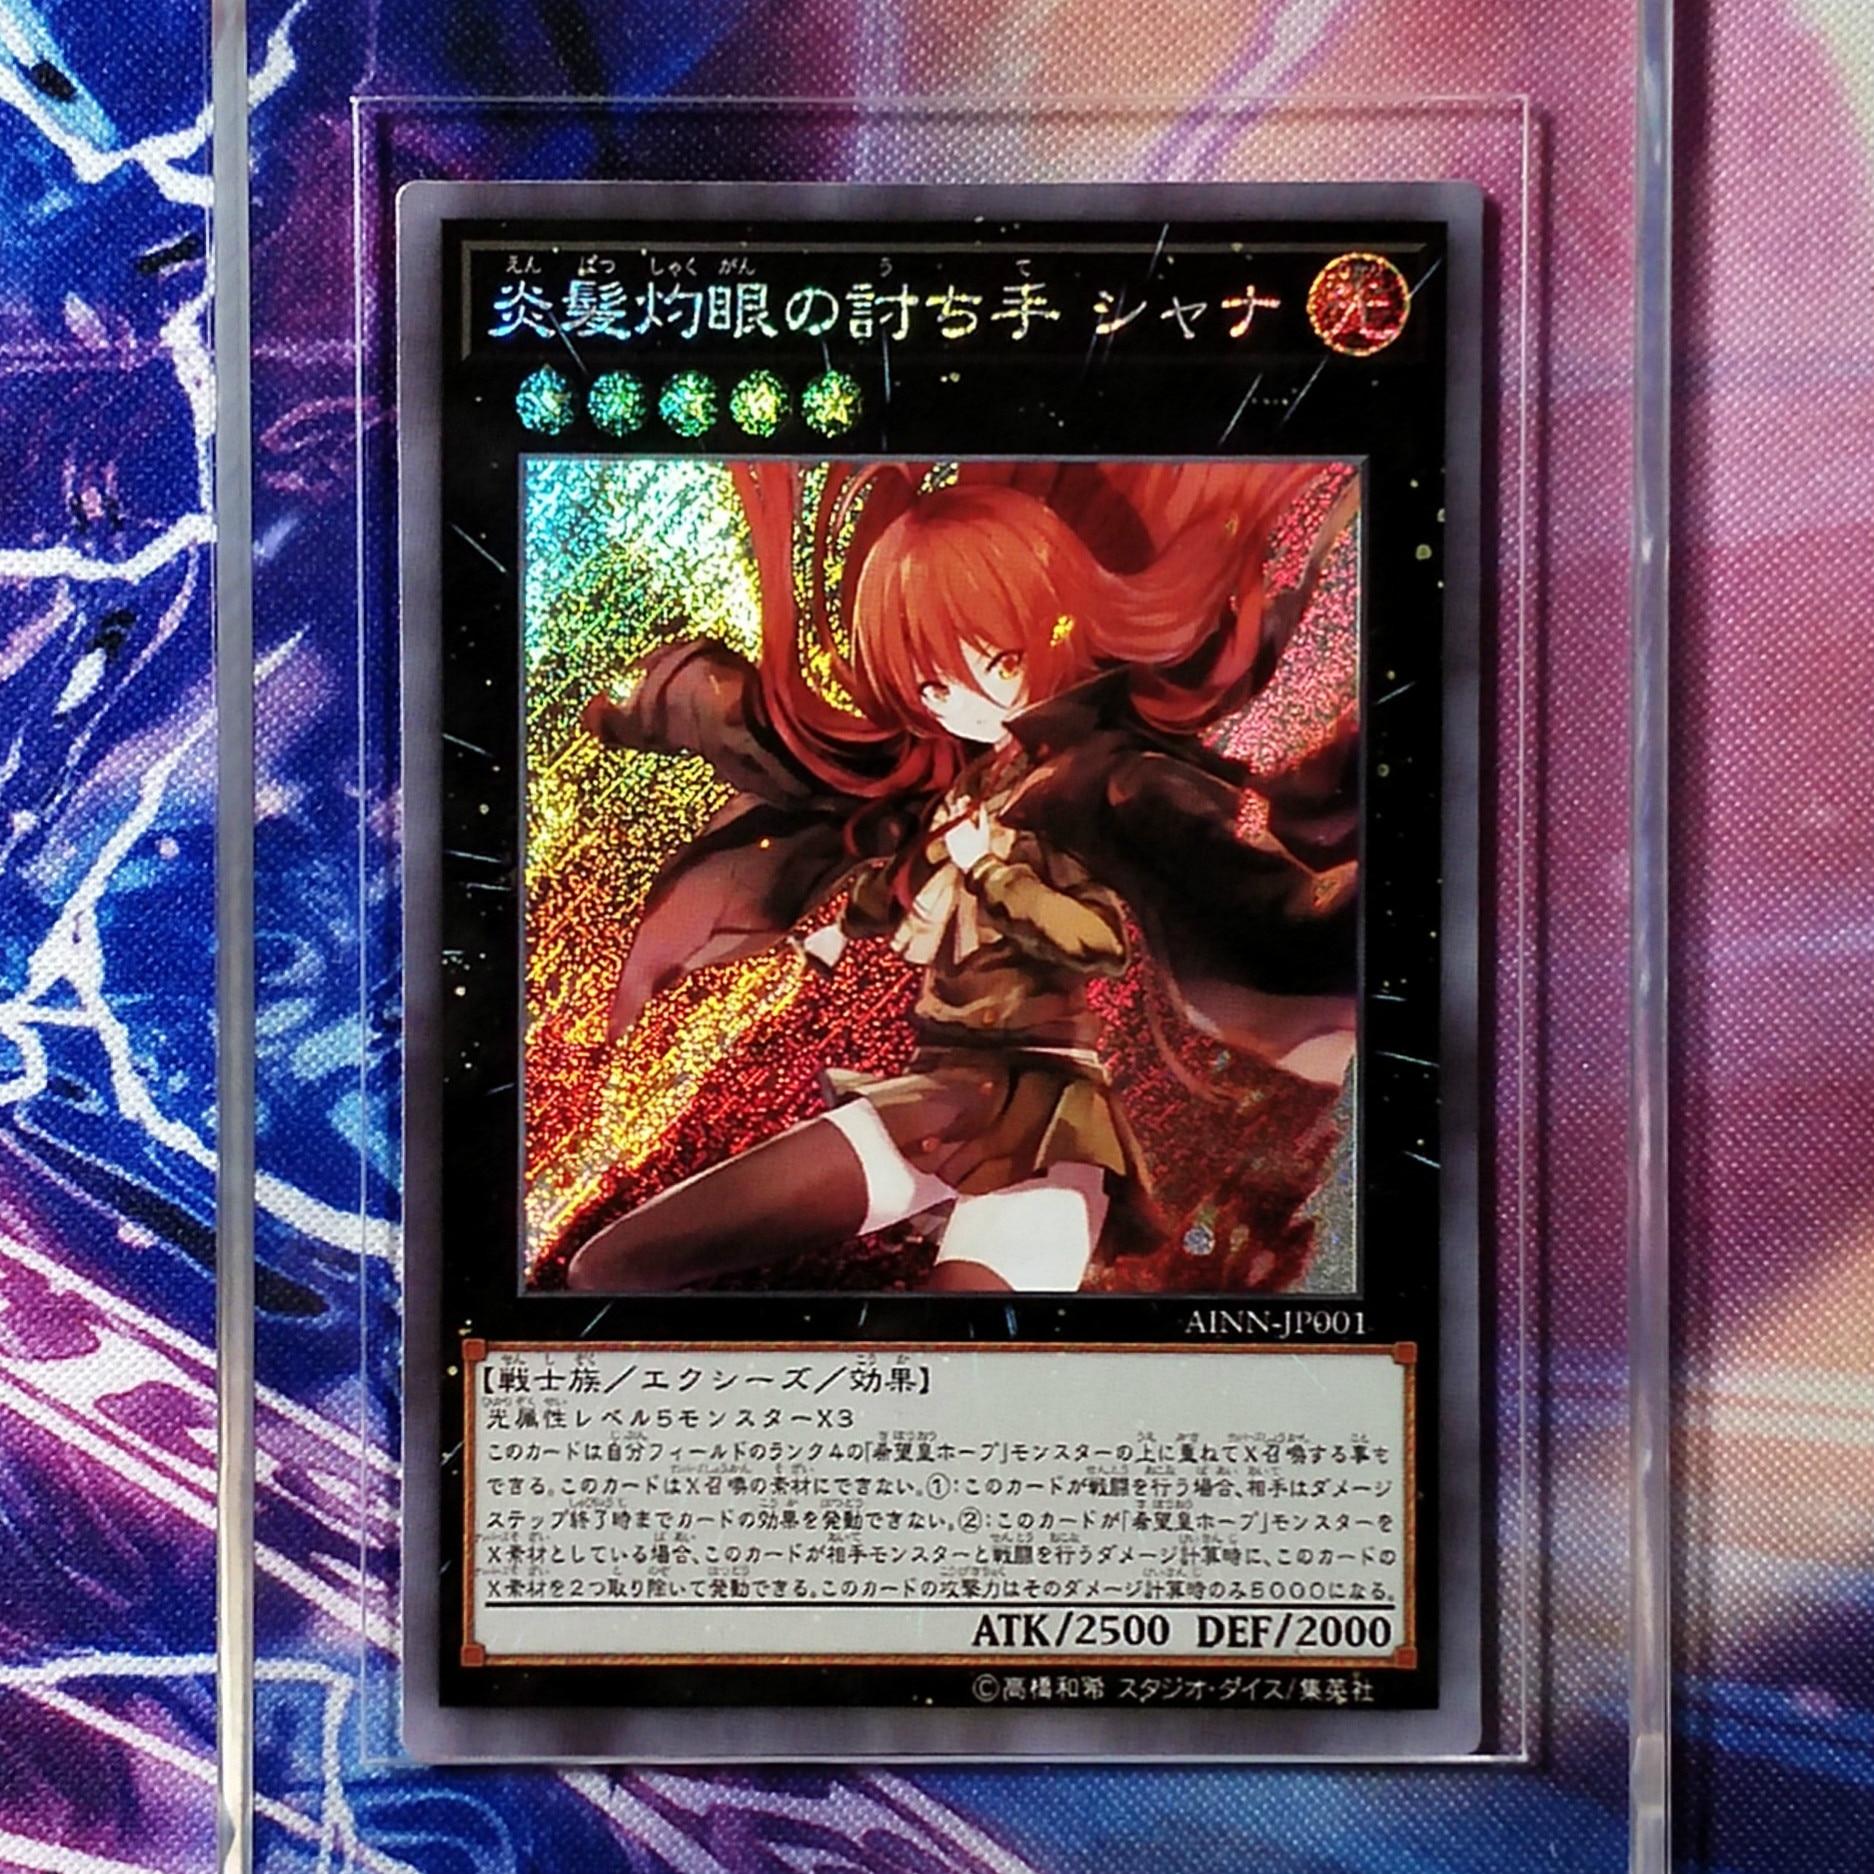 Red Hair Shakugan No Shana Yu Gi Oh DIY Colorful Toys Hobbies Hobby Collectibles Game Collection Anime Cards